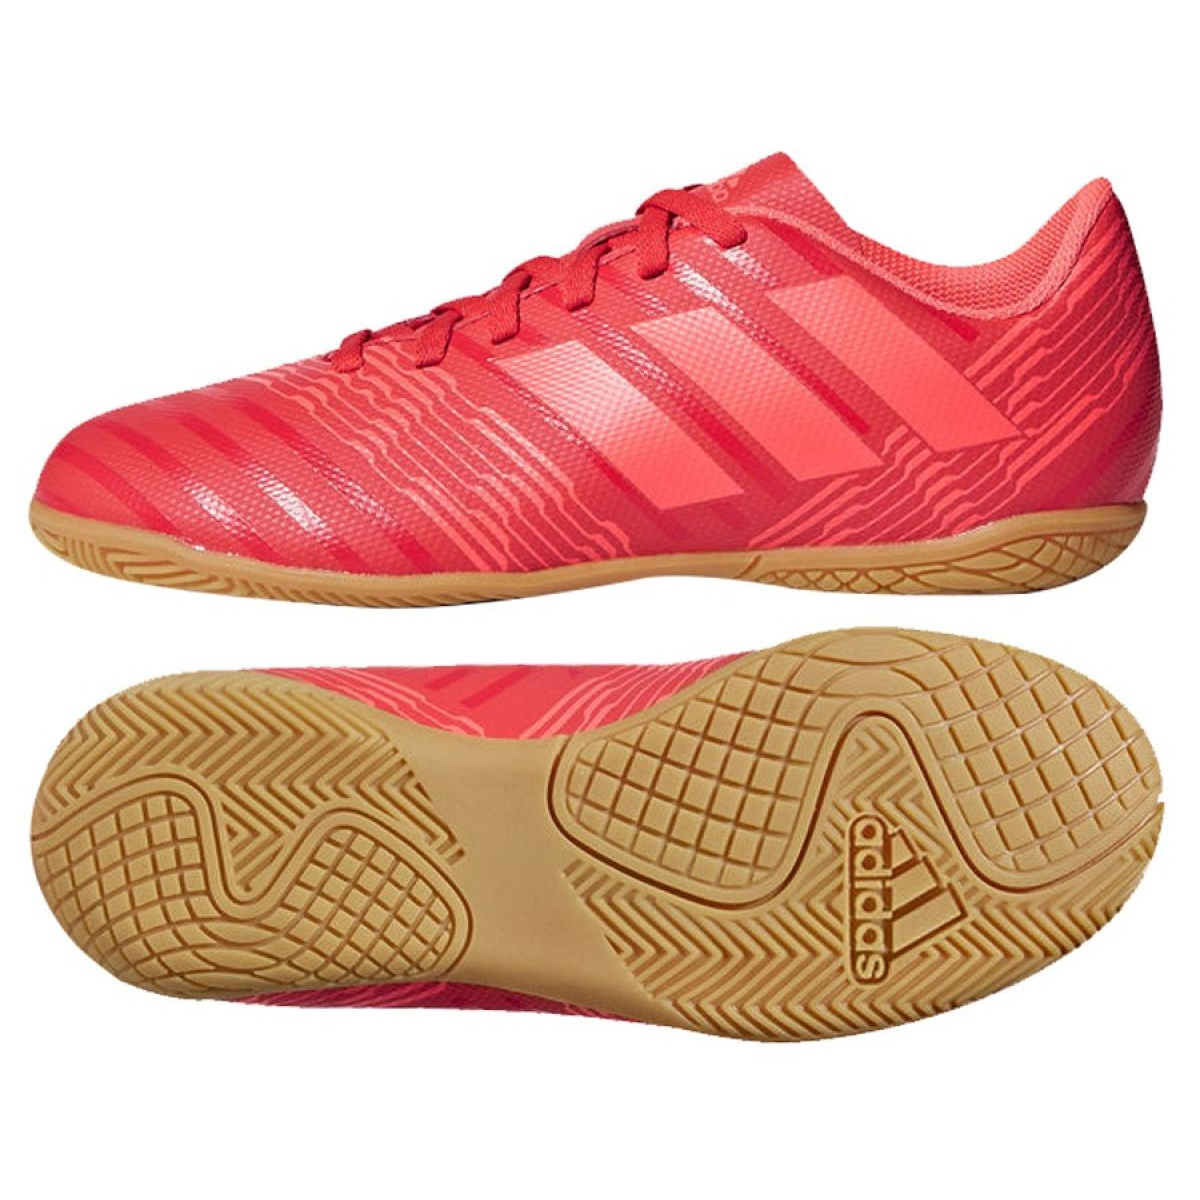 62b53ea39ae87 Adidas Indoor-Schuhe Nemeziz Tango 17.4 in Jr CP9222 - ButyModne.pl